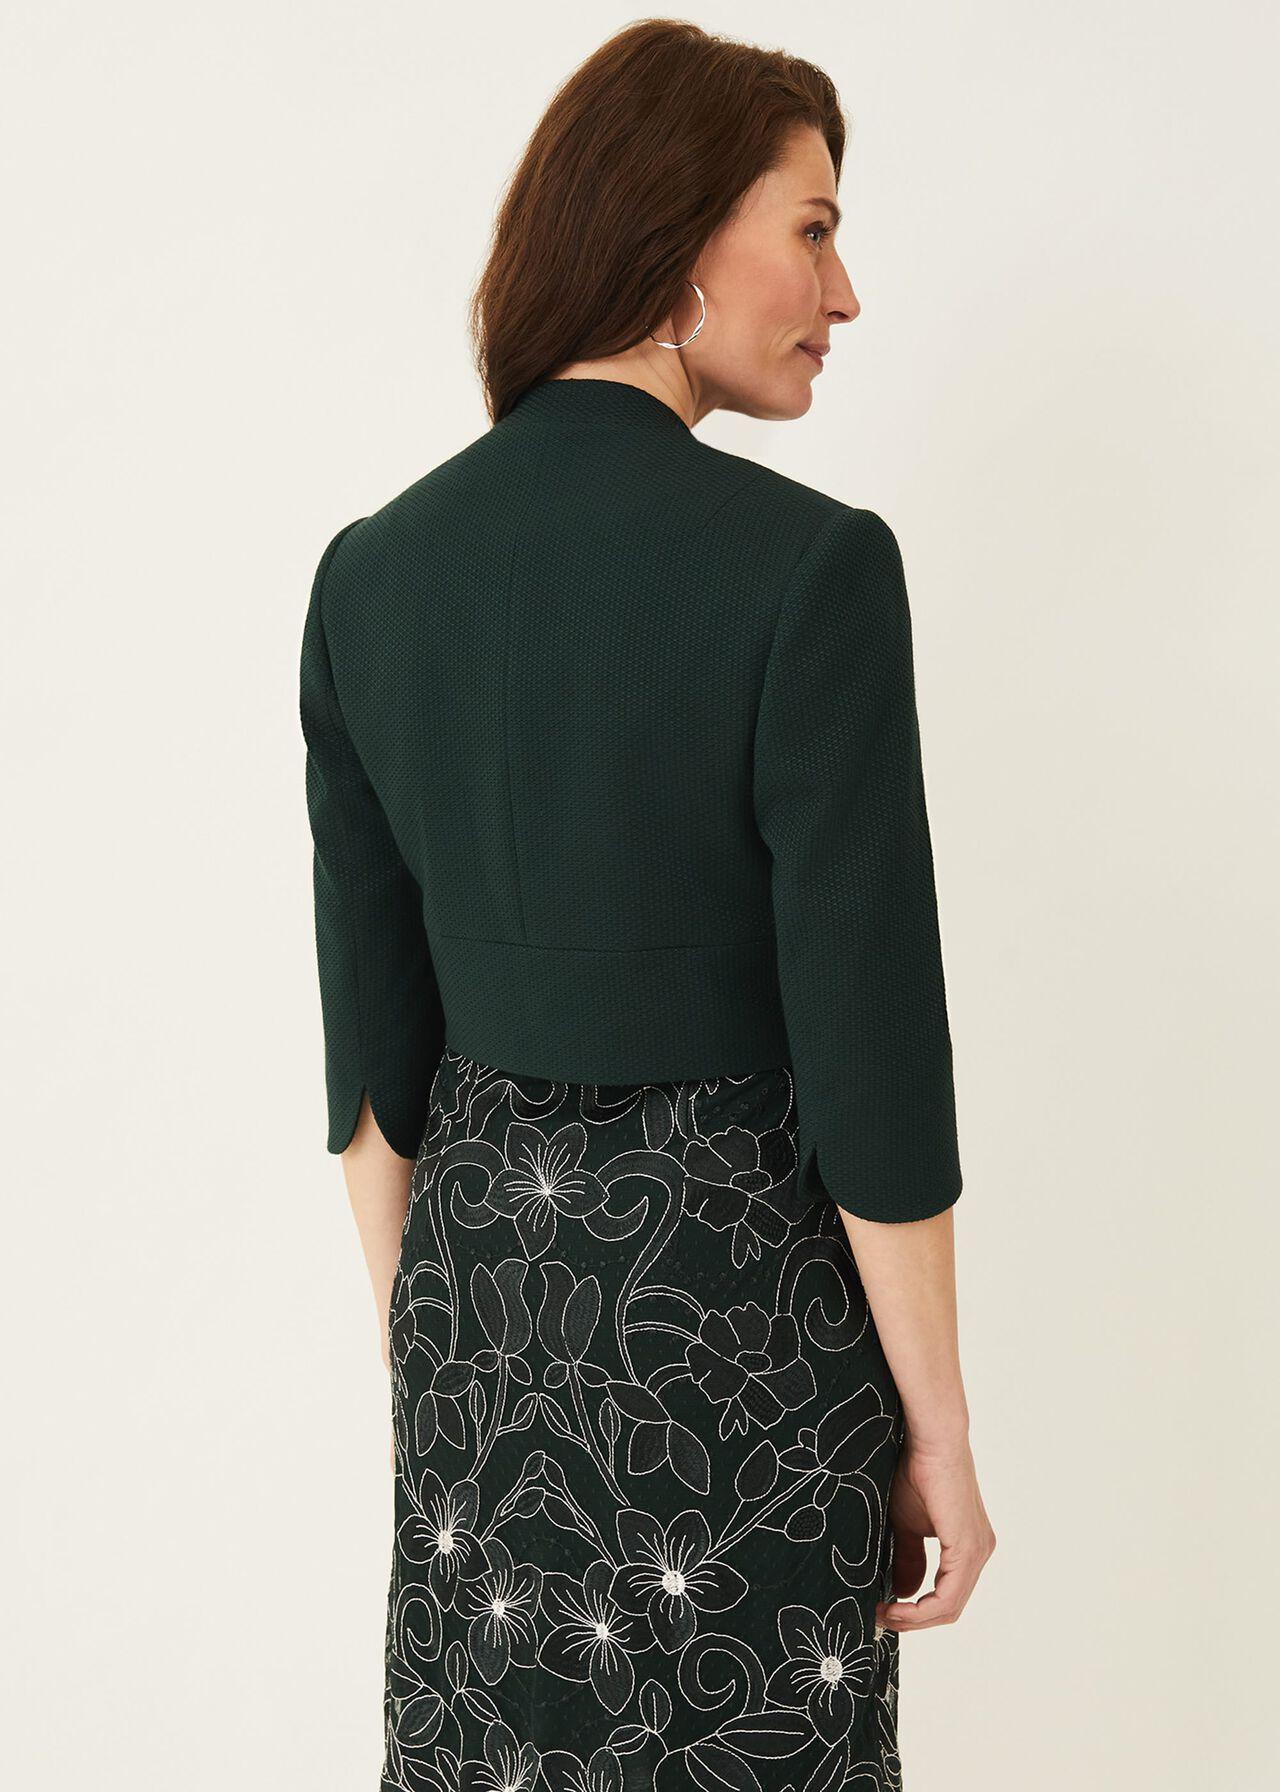 Seraphina Textured Jacket